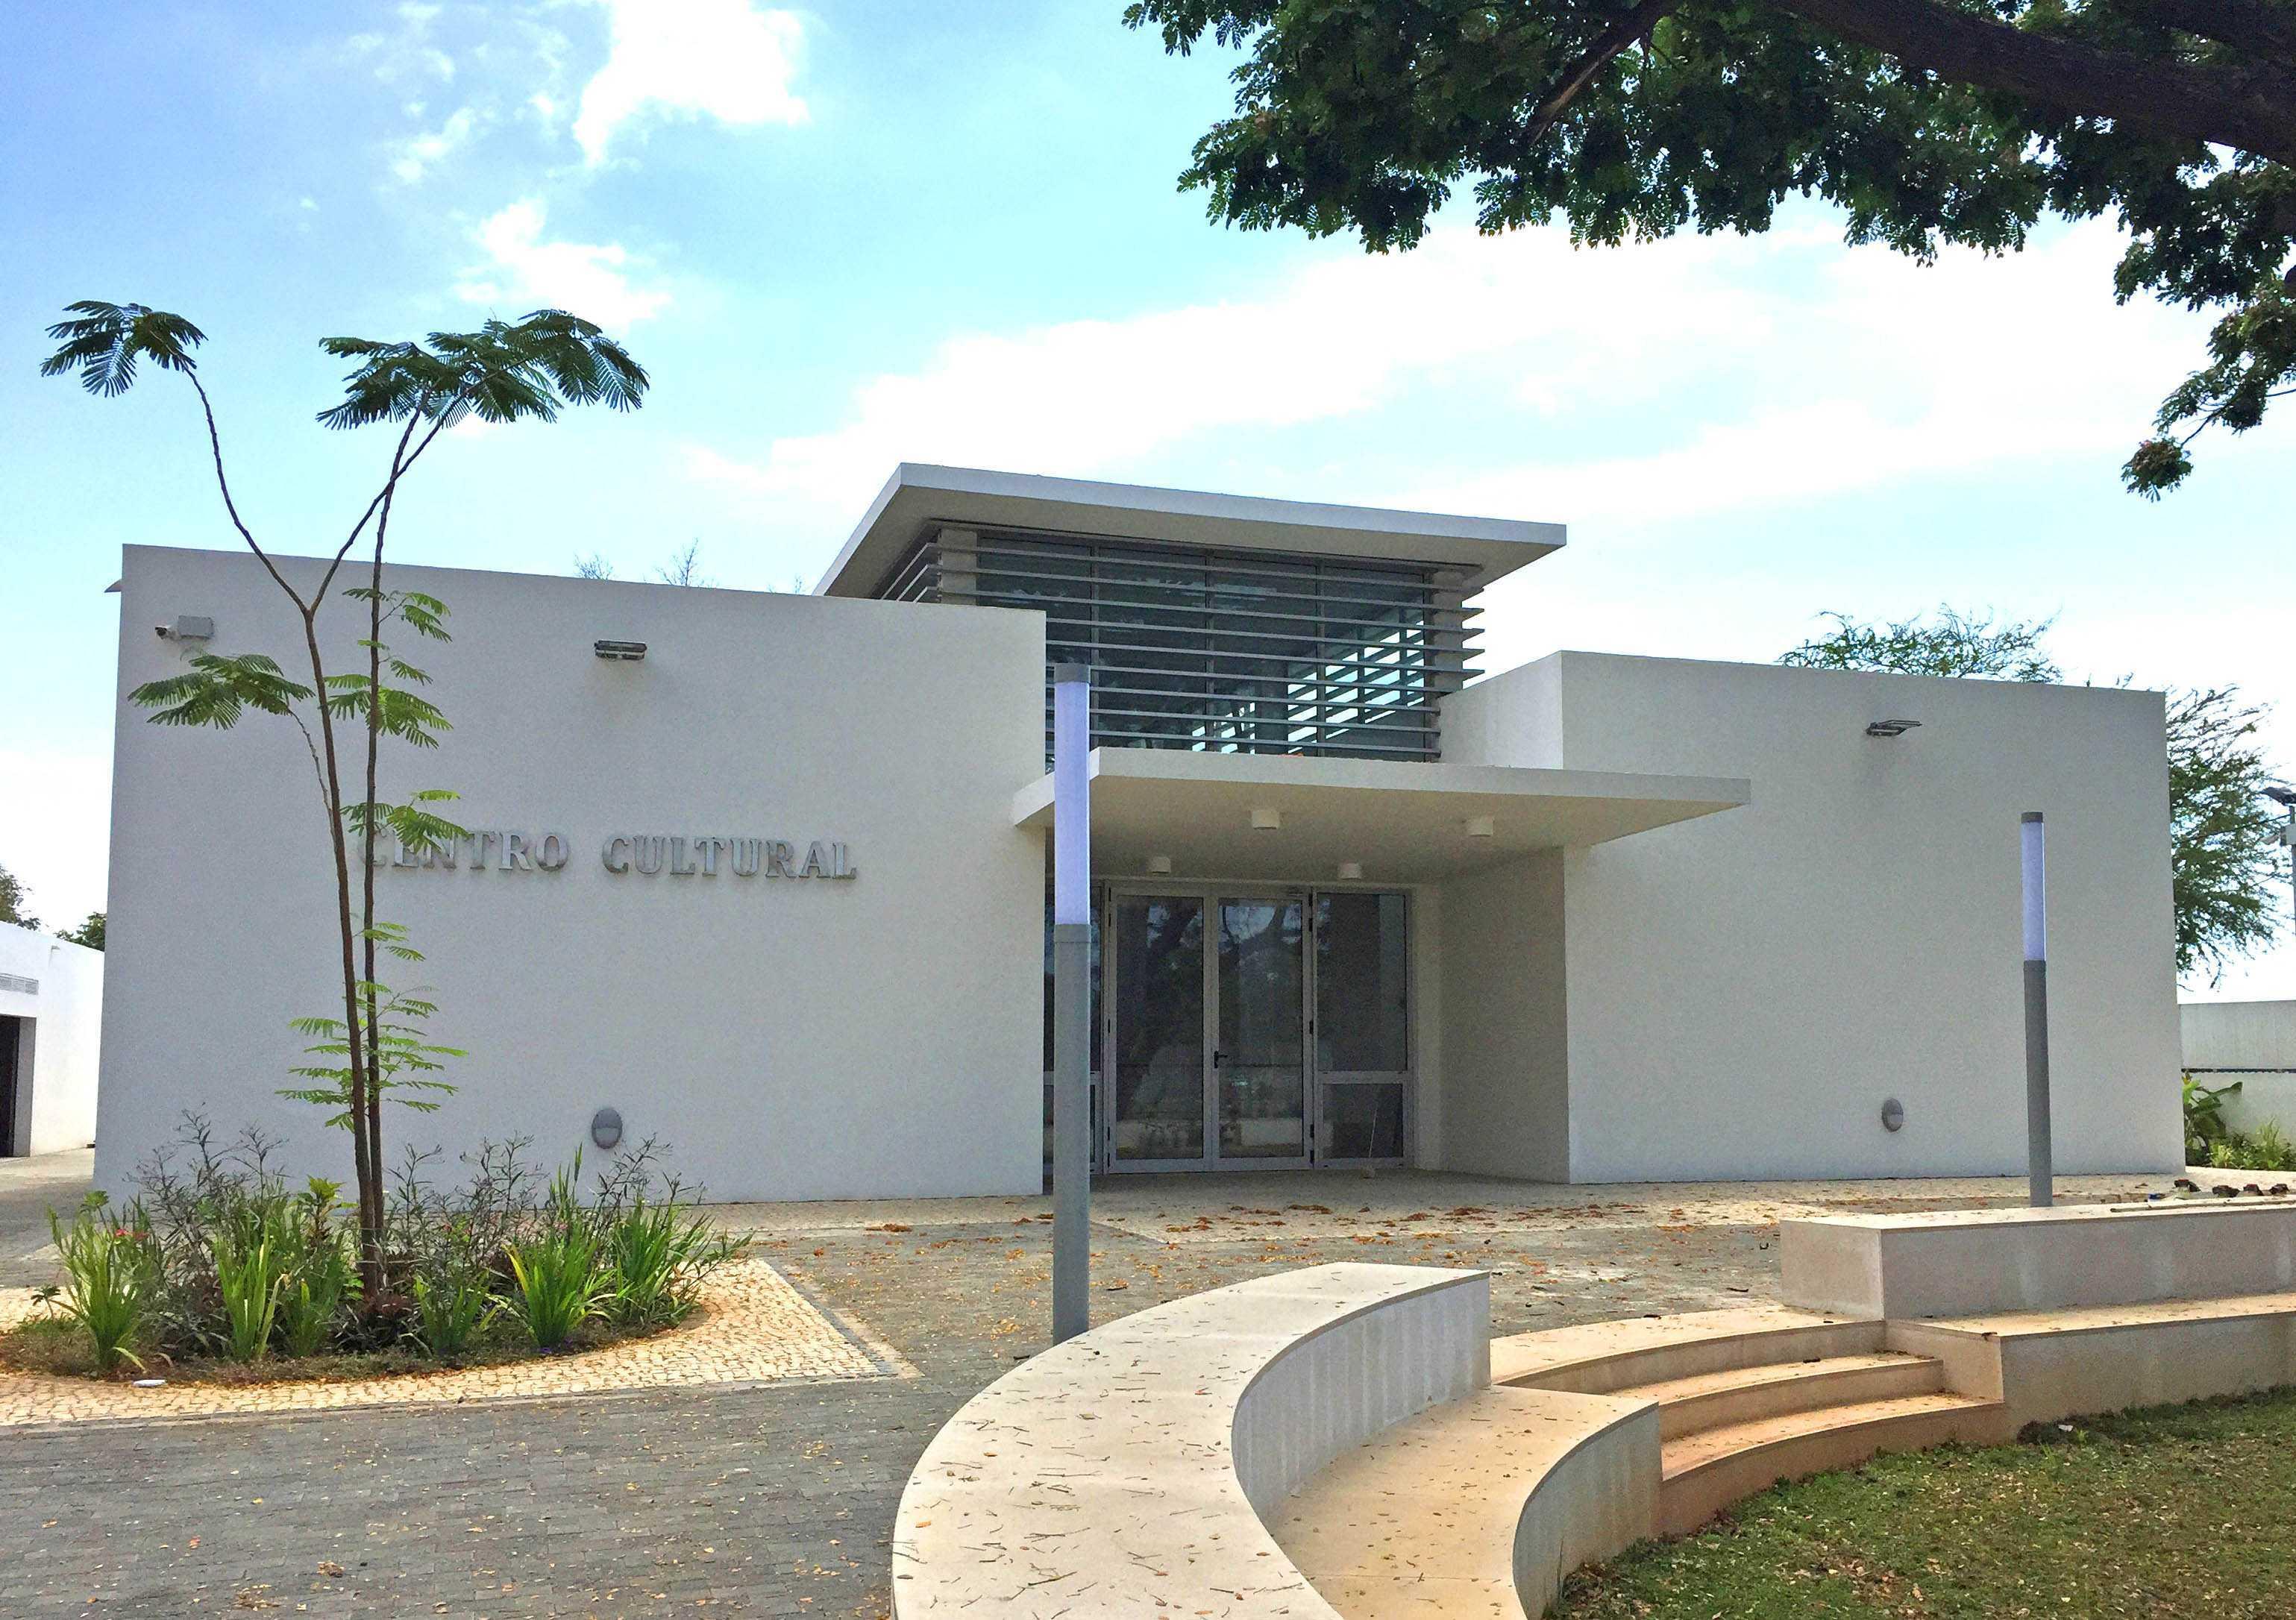 Nla Timor Urban Planning Architecture & Engineering Portugal Embassy Dili, Timor Leste Timor-Leste  Nla-Timor-Urban-Planning-Architecture-Engineering-Portugal-Embassy-Dili-Timor-Leste Minimalist  50352